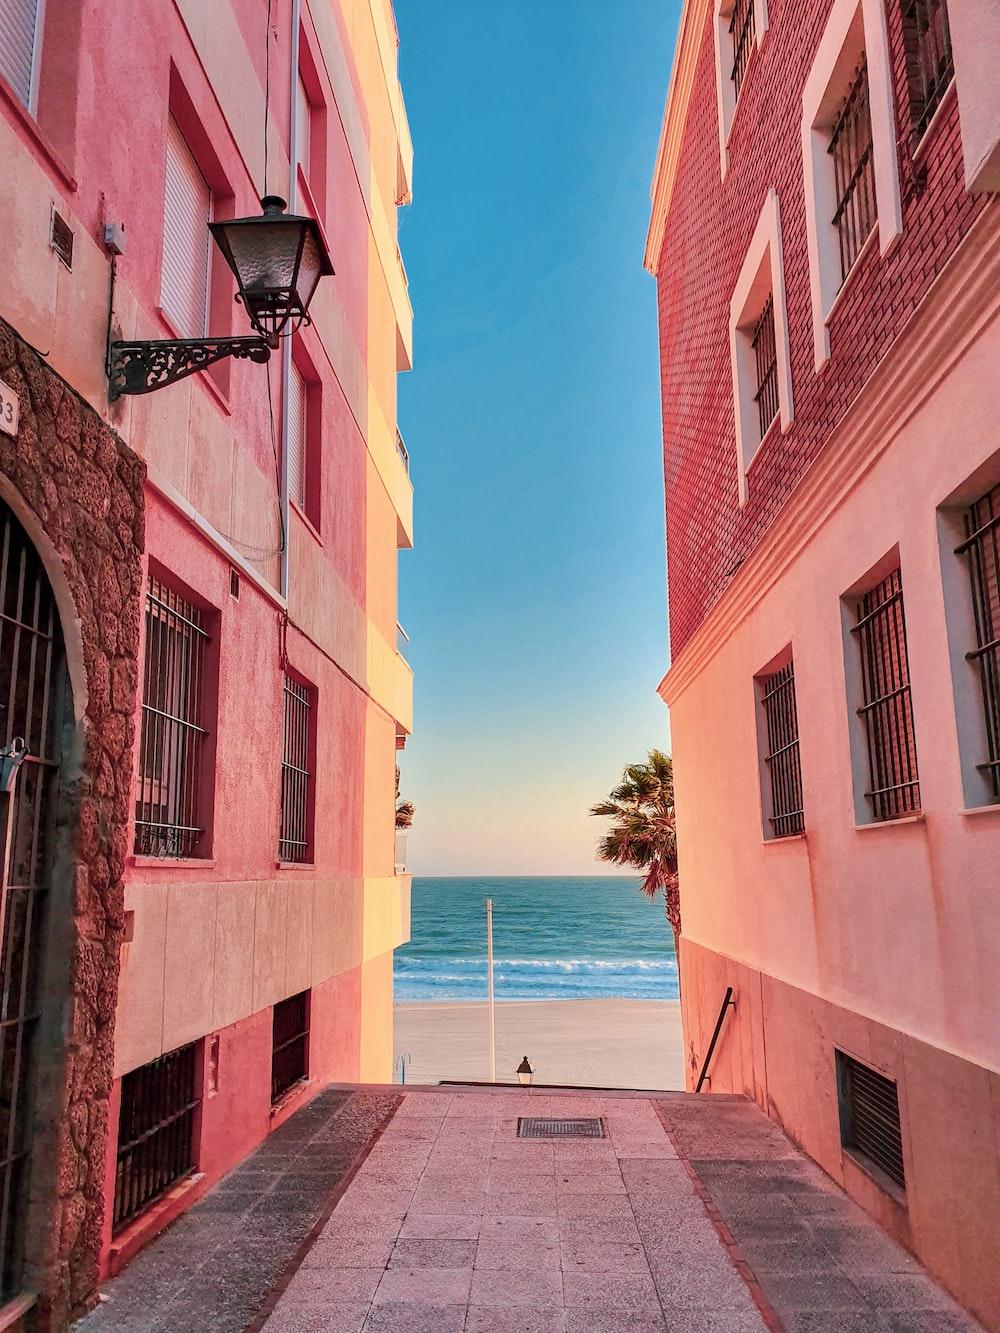 alley photography of walkway between orange building during daytime